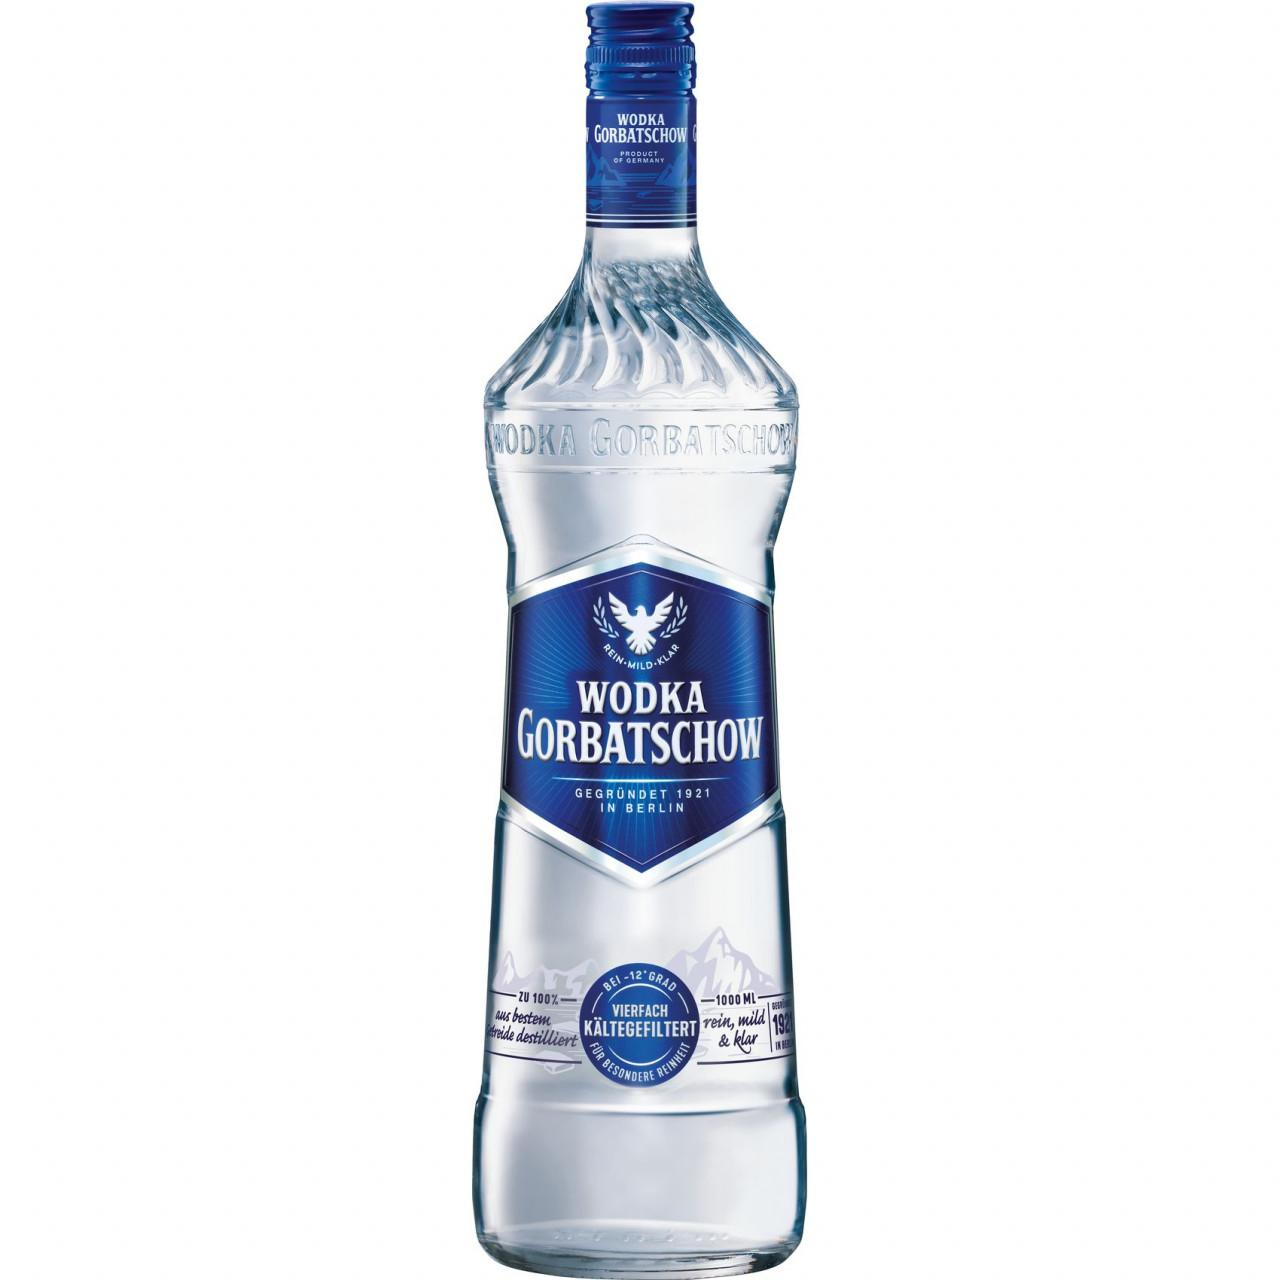 Wodka Gorbatschow 37,5% 1l